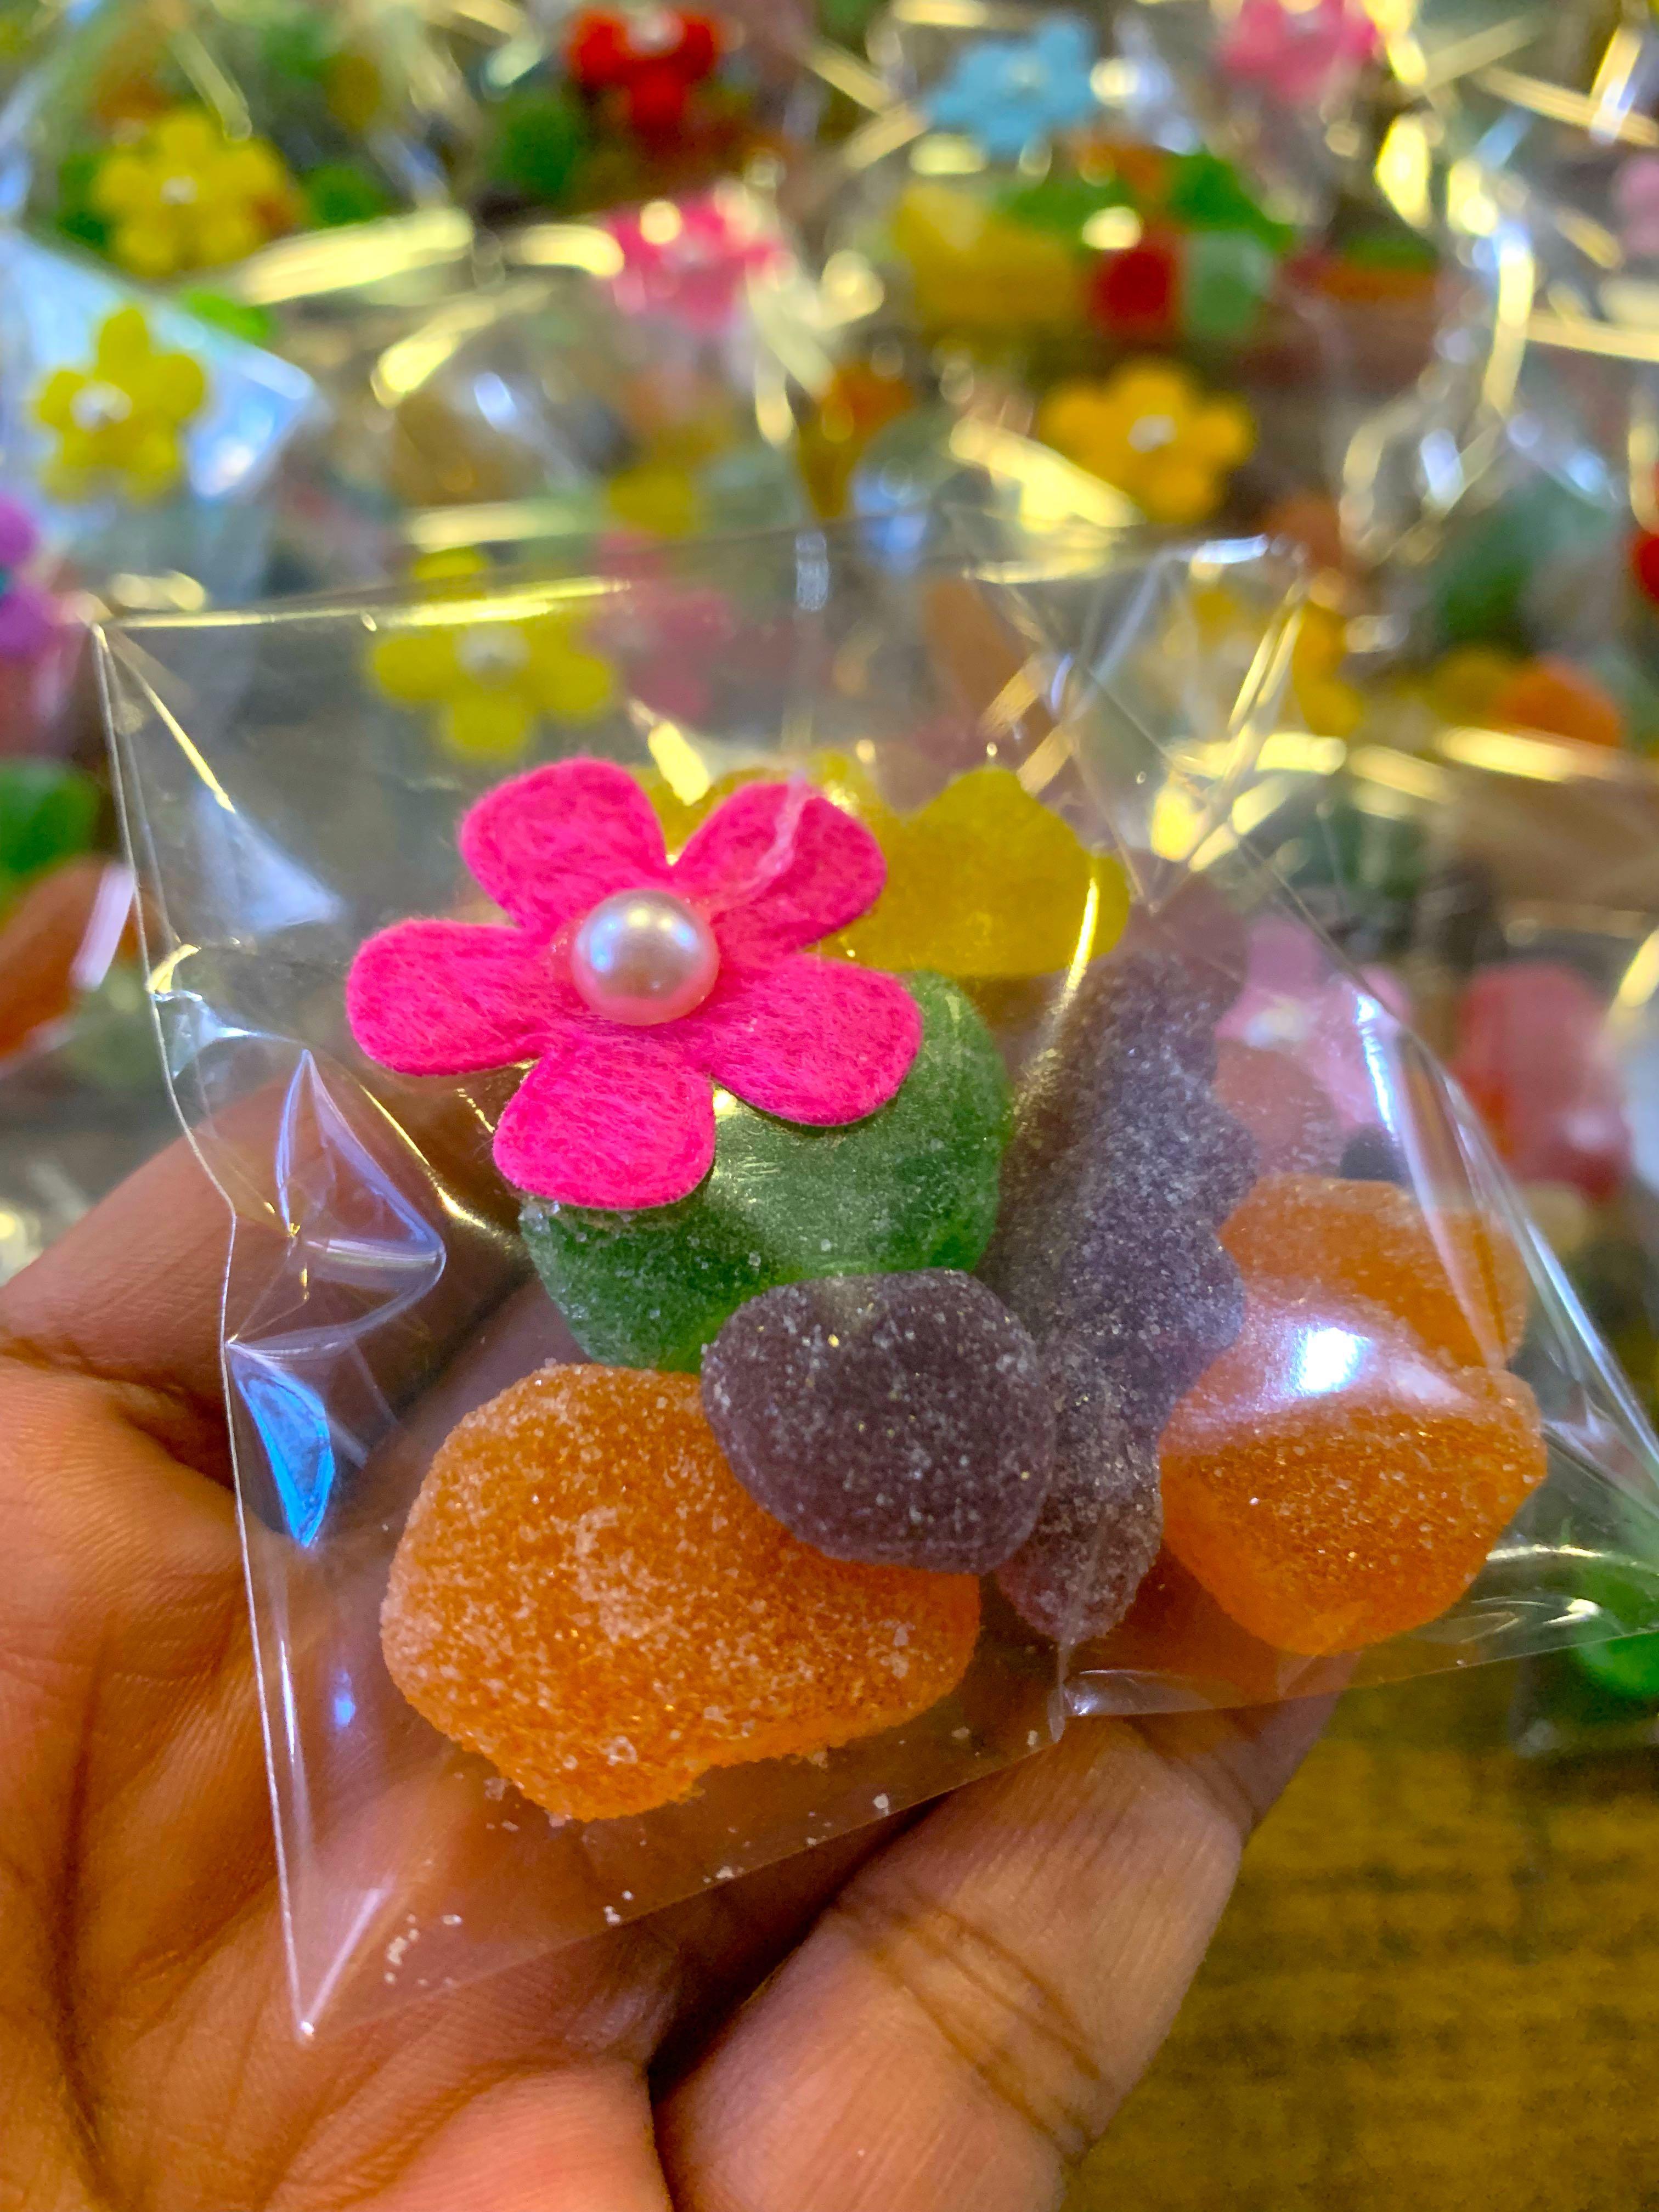 Mixed candies / doorgift